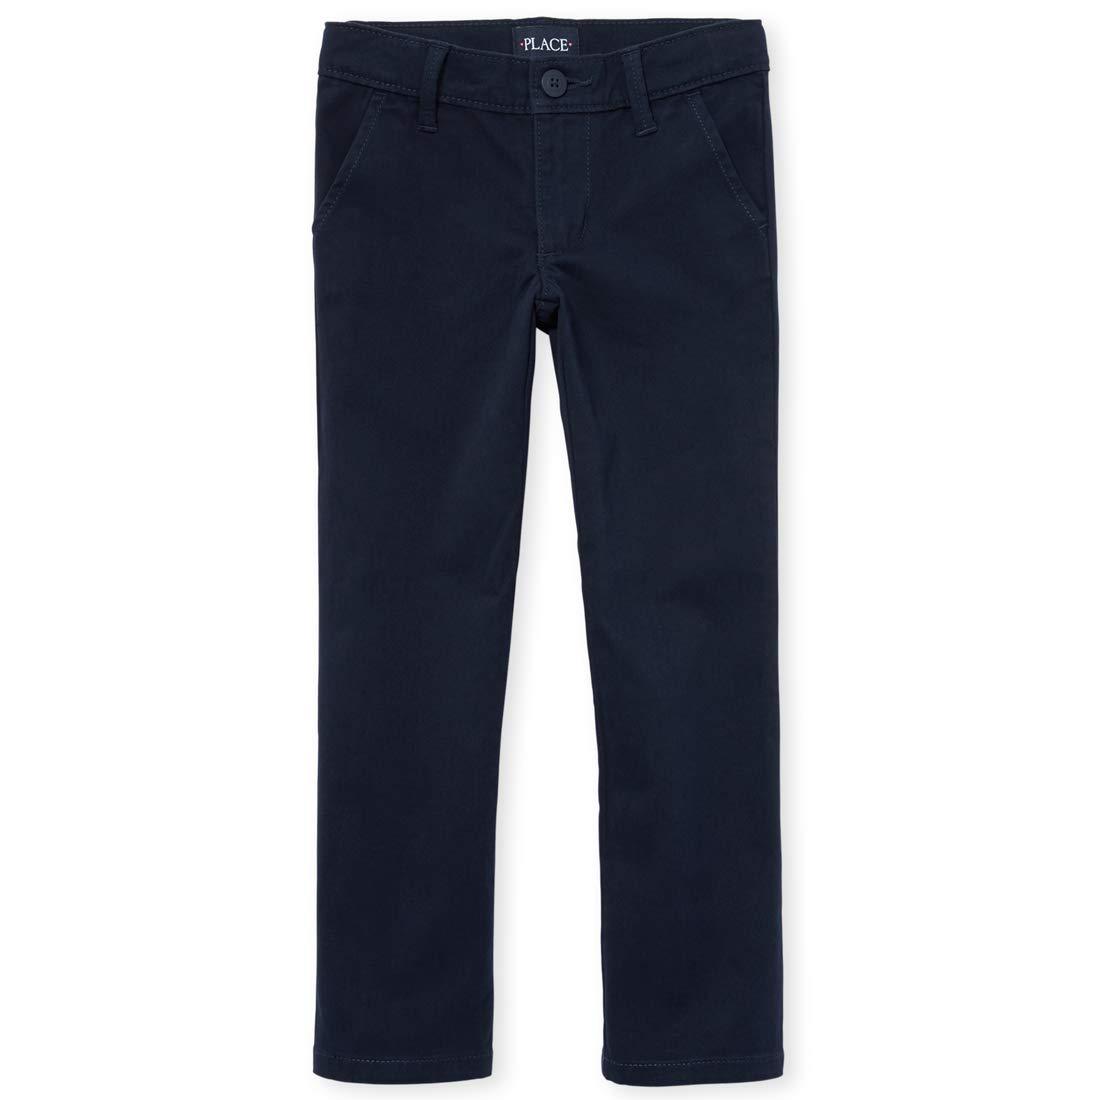 The Children's Place Girls' Skinny Uniform Pants